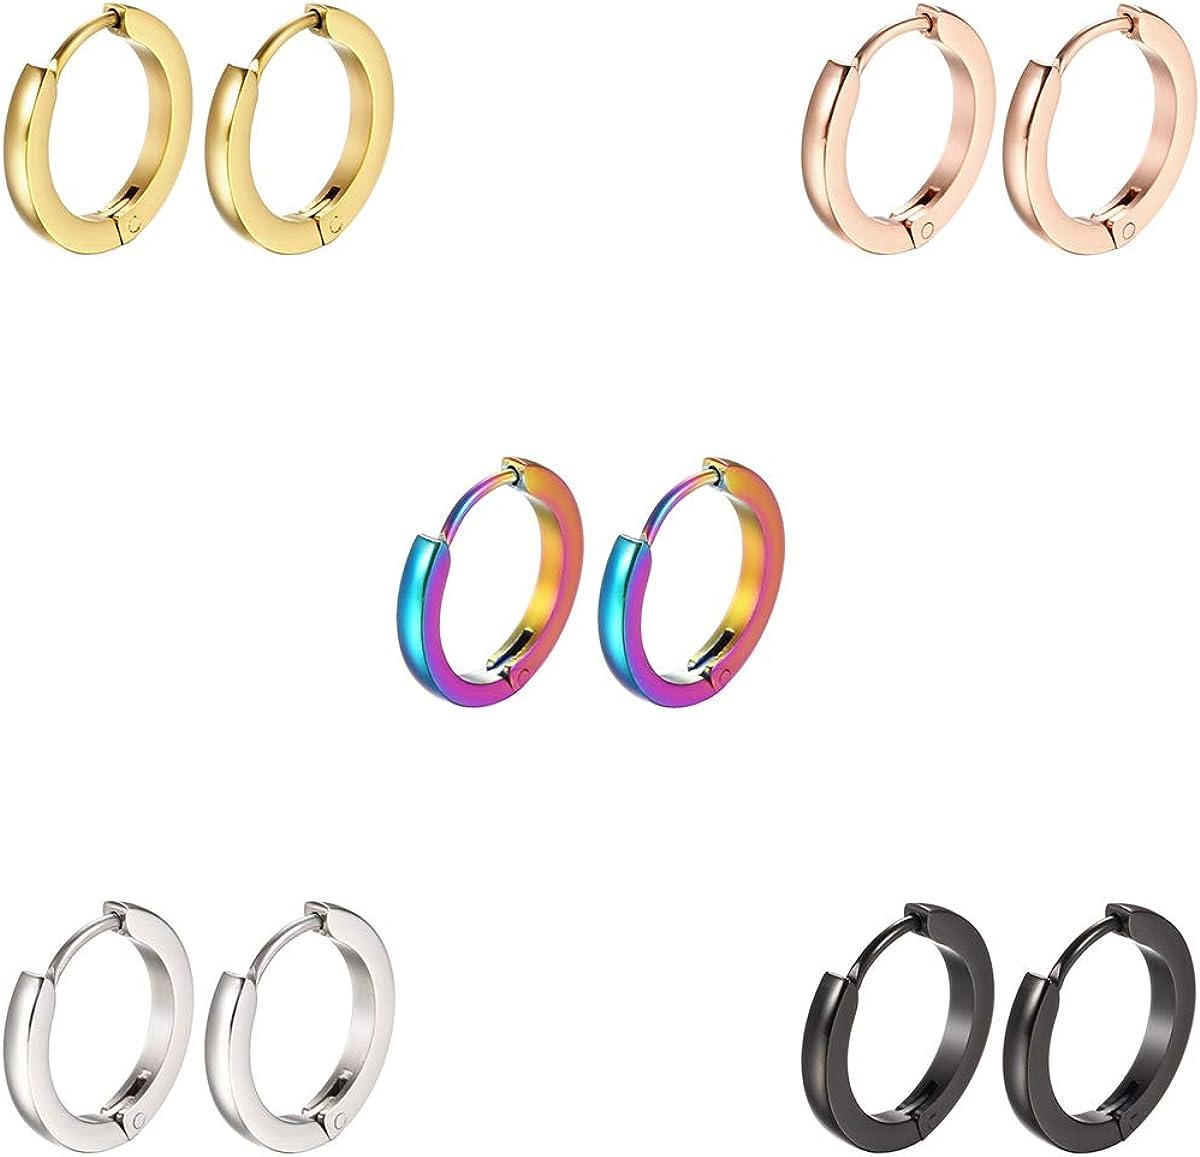 Stainless Steel Hoop Earrings 7mm/9mm/12mm Small Huggie Earrings for Women and Men